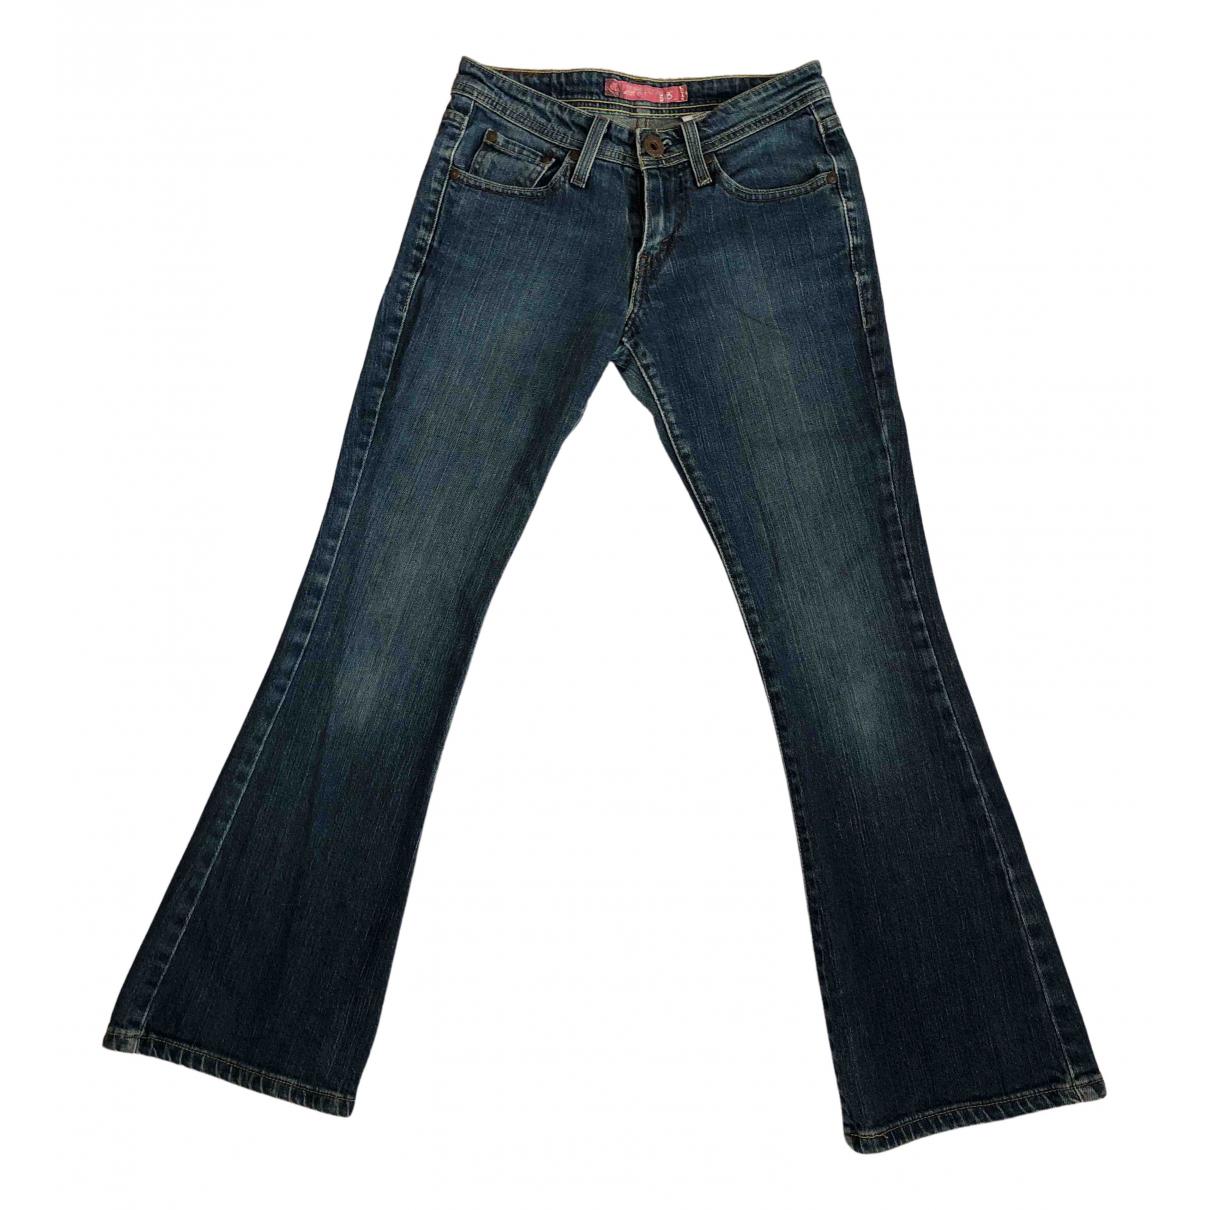 Levi's N Blue Denim - Jeans Jeans for Women 24 US